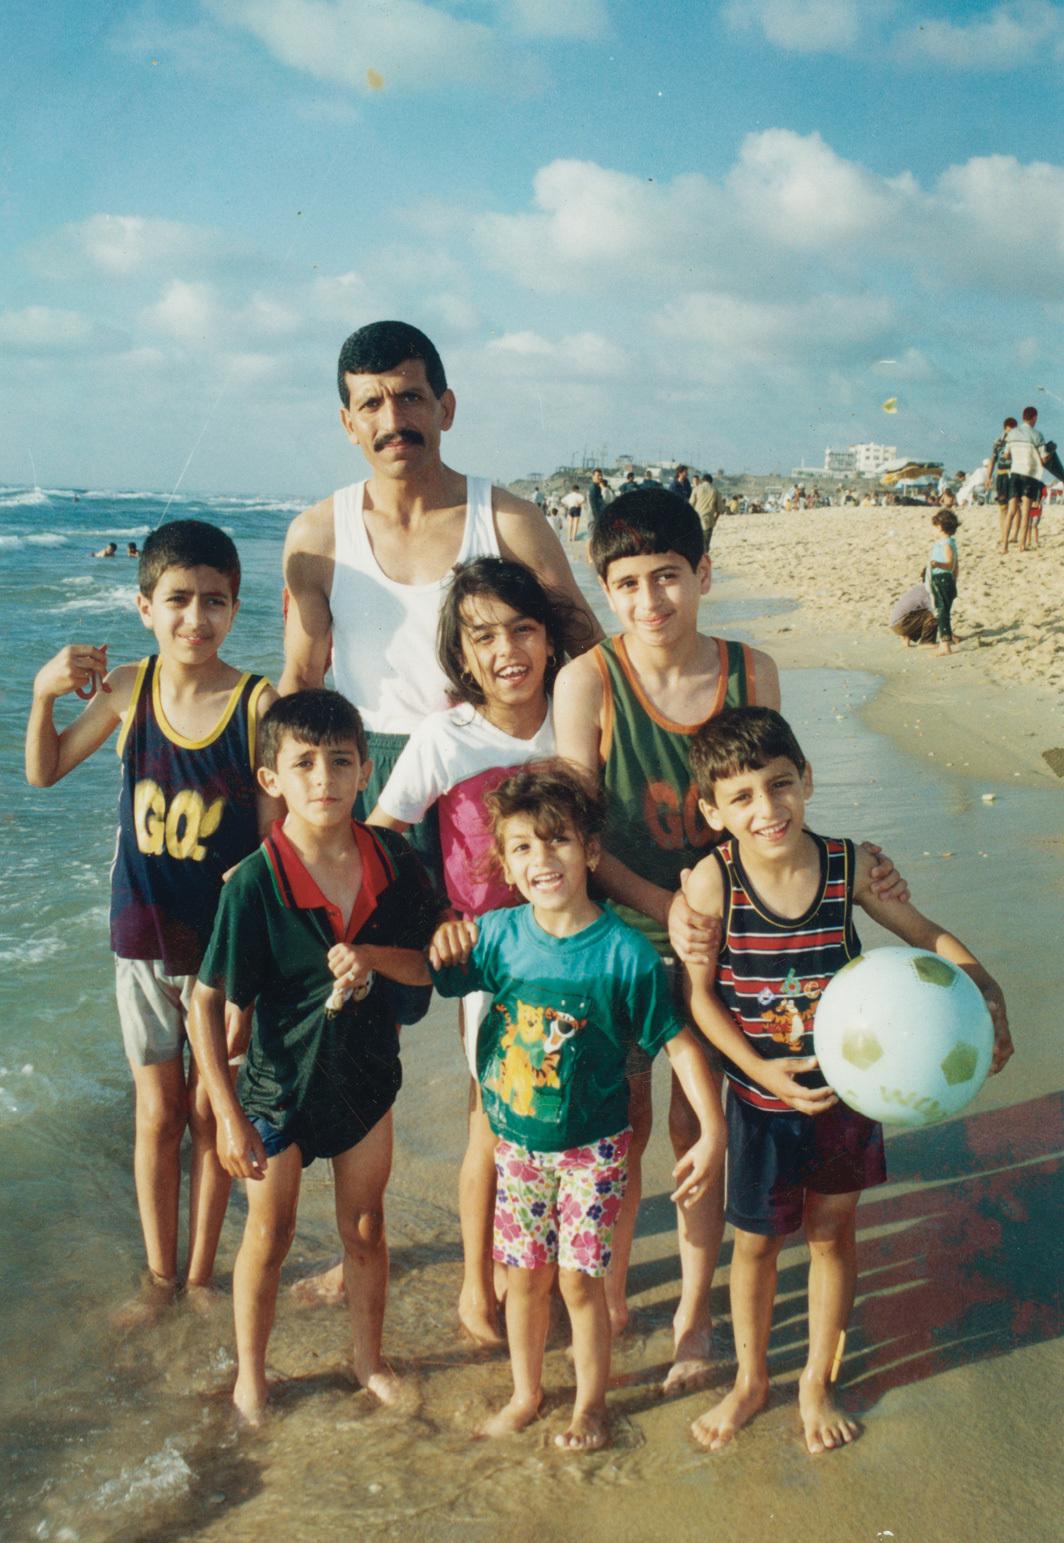 Salím Ázar with family, Gaza beach, 1999. From the Palestinian Museum Digital Archive.